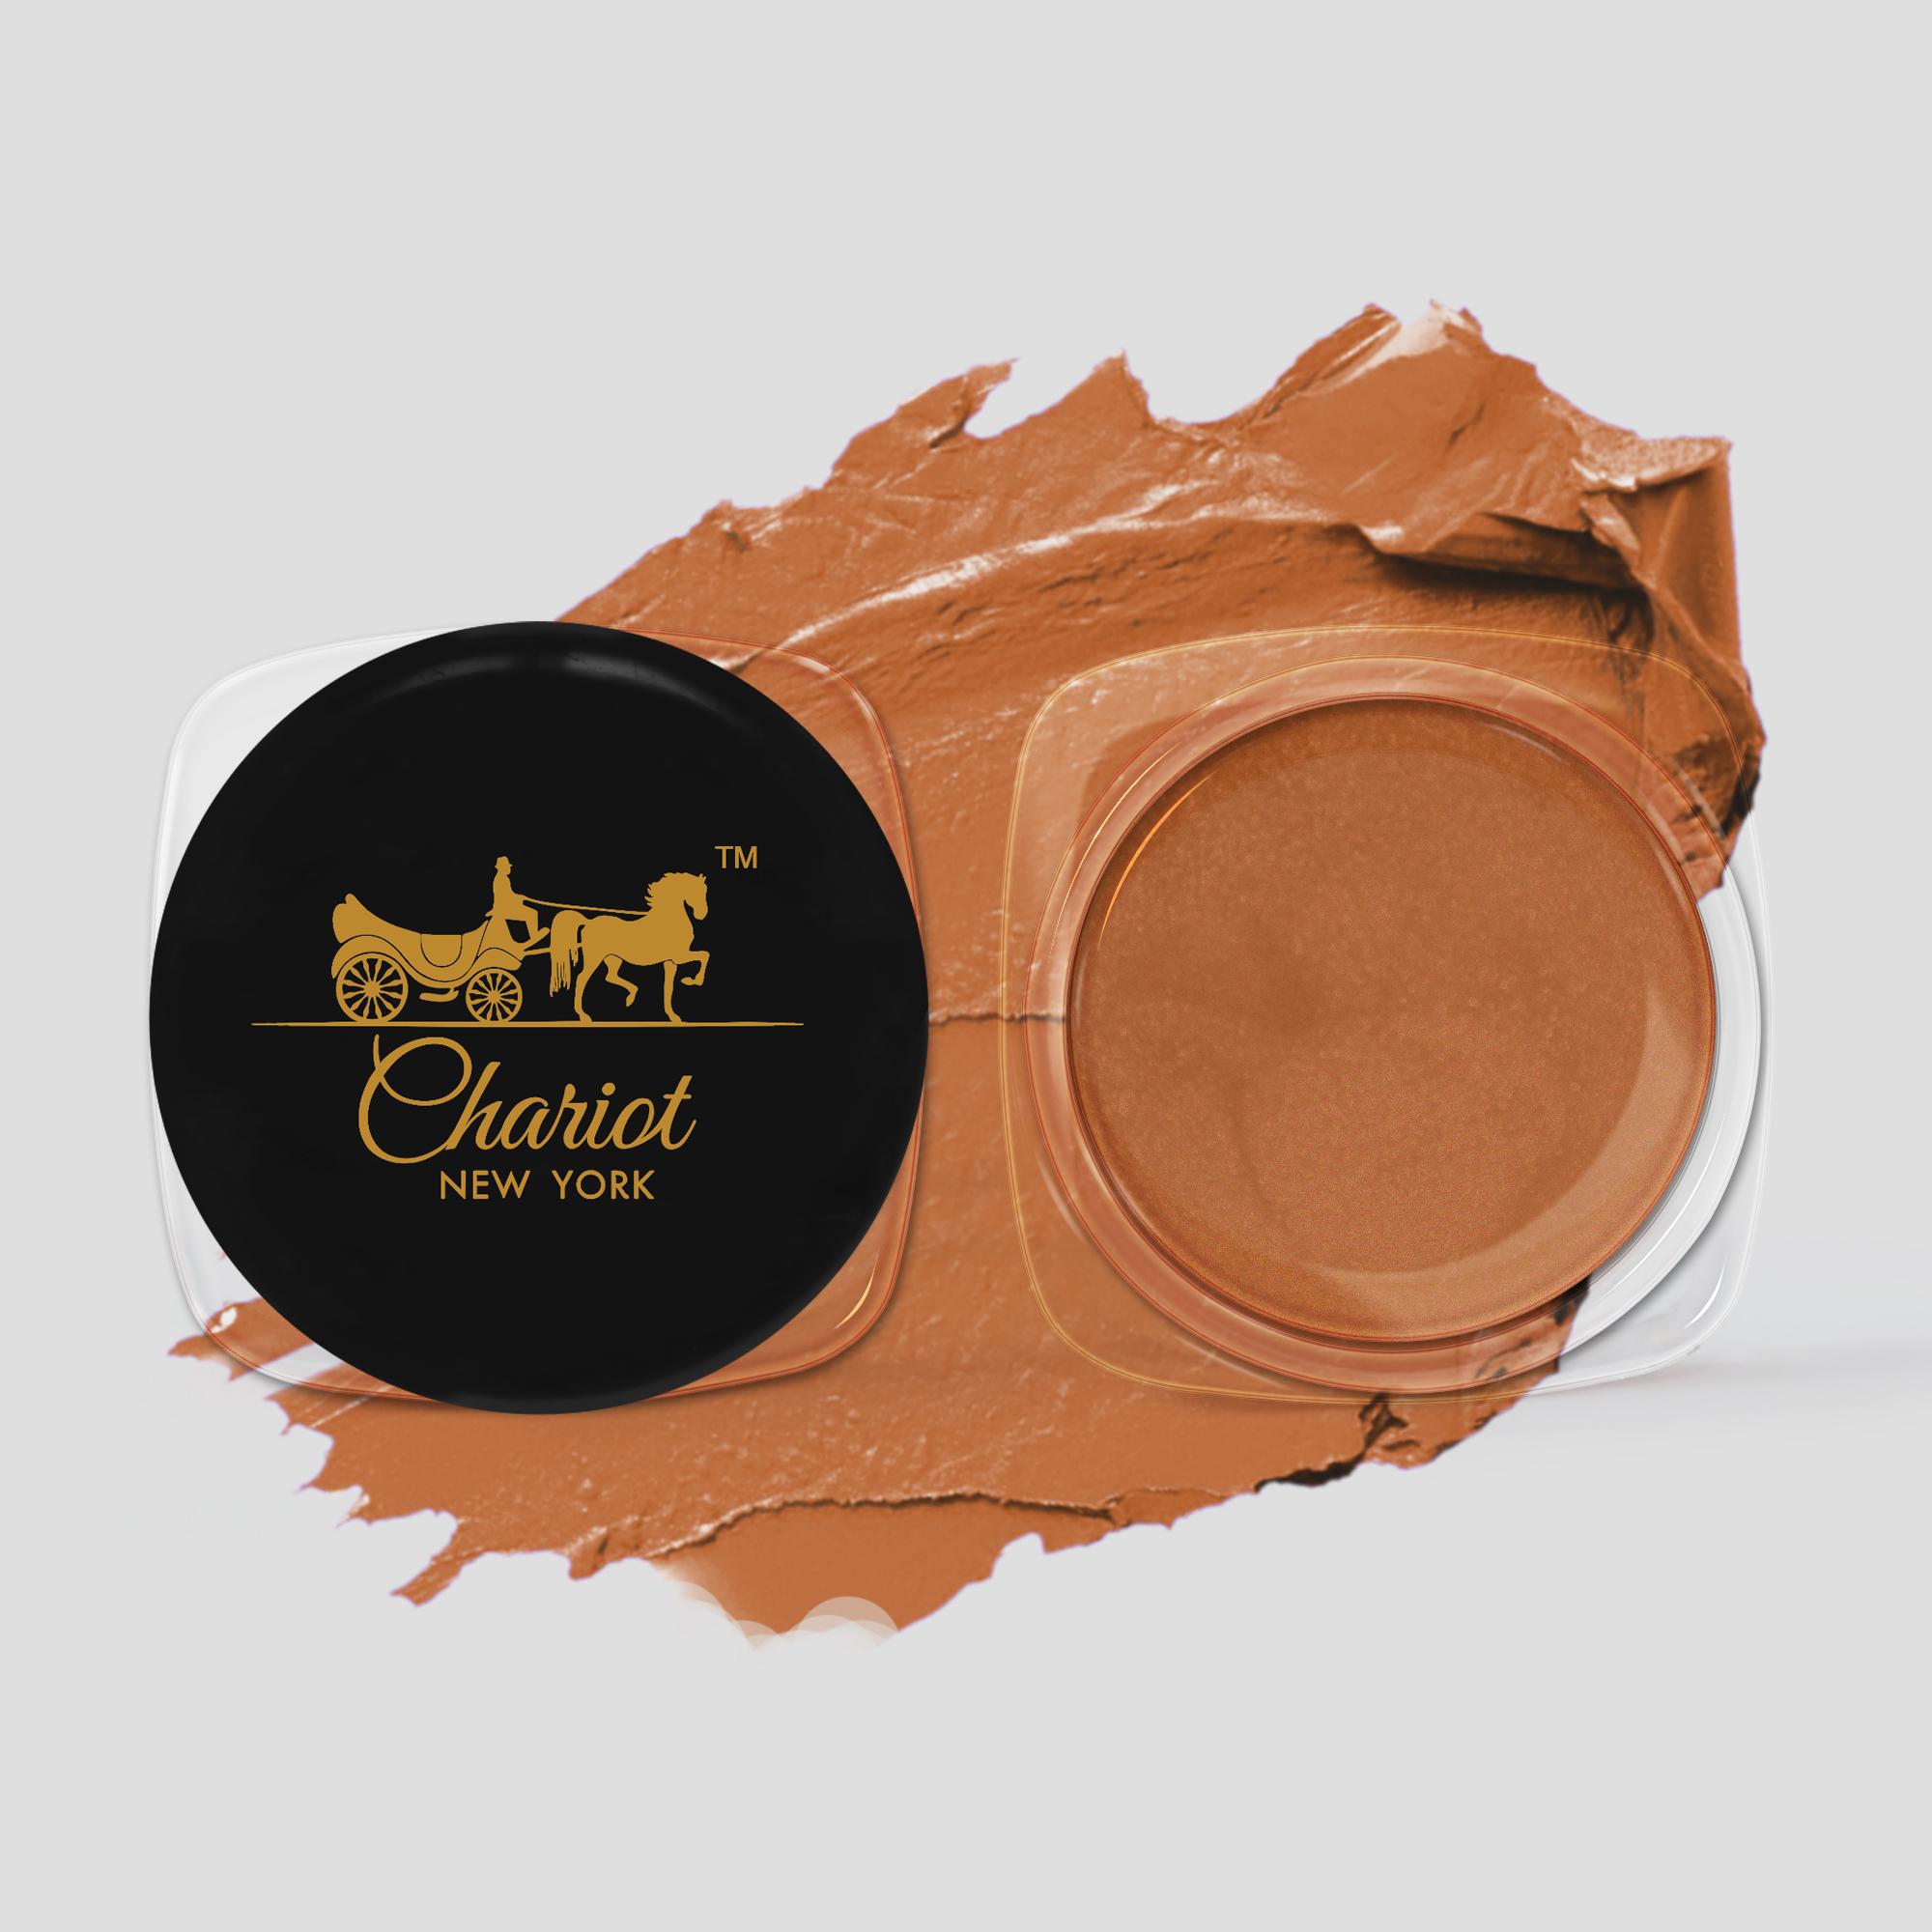 Chariot New York Copper Bronze Shimmer Blush (Bronze)